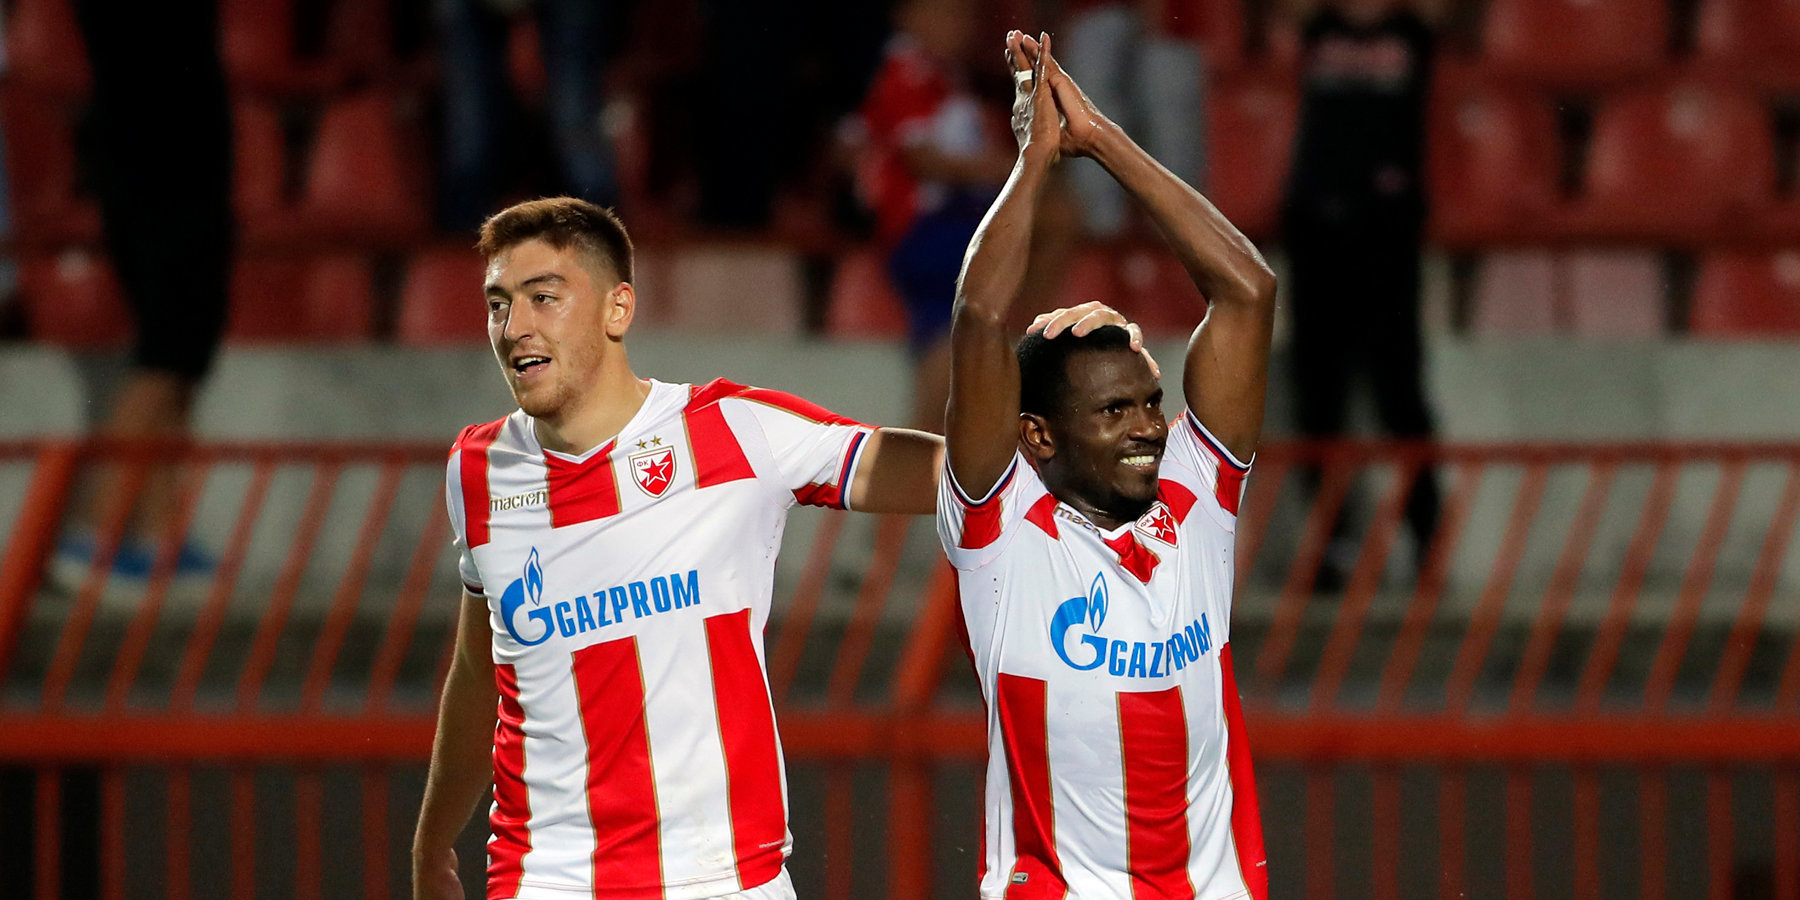 Боруссия менхенгладбах црвена звезда финал кубка уефа